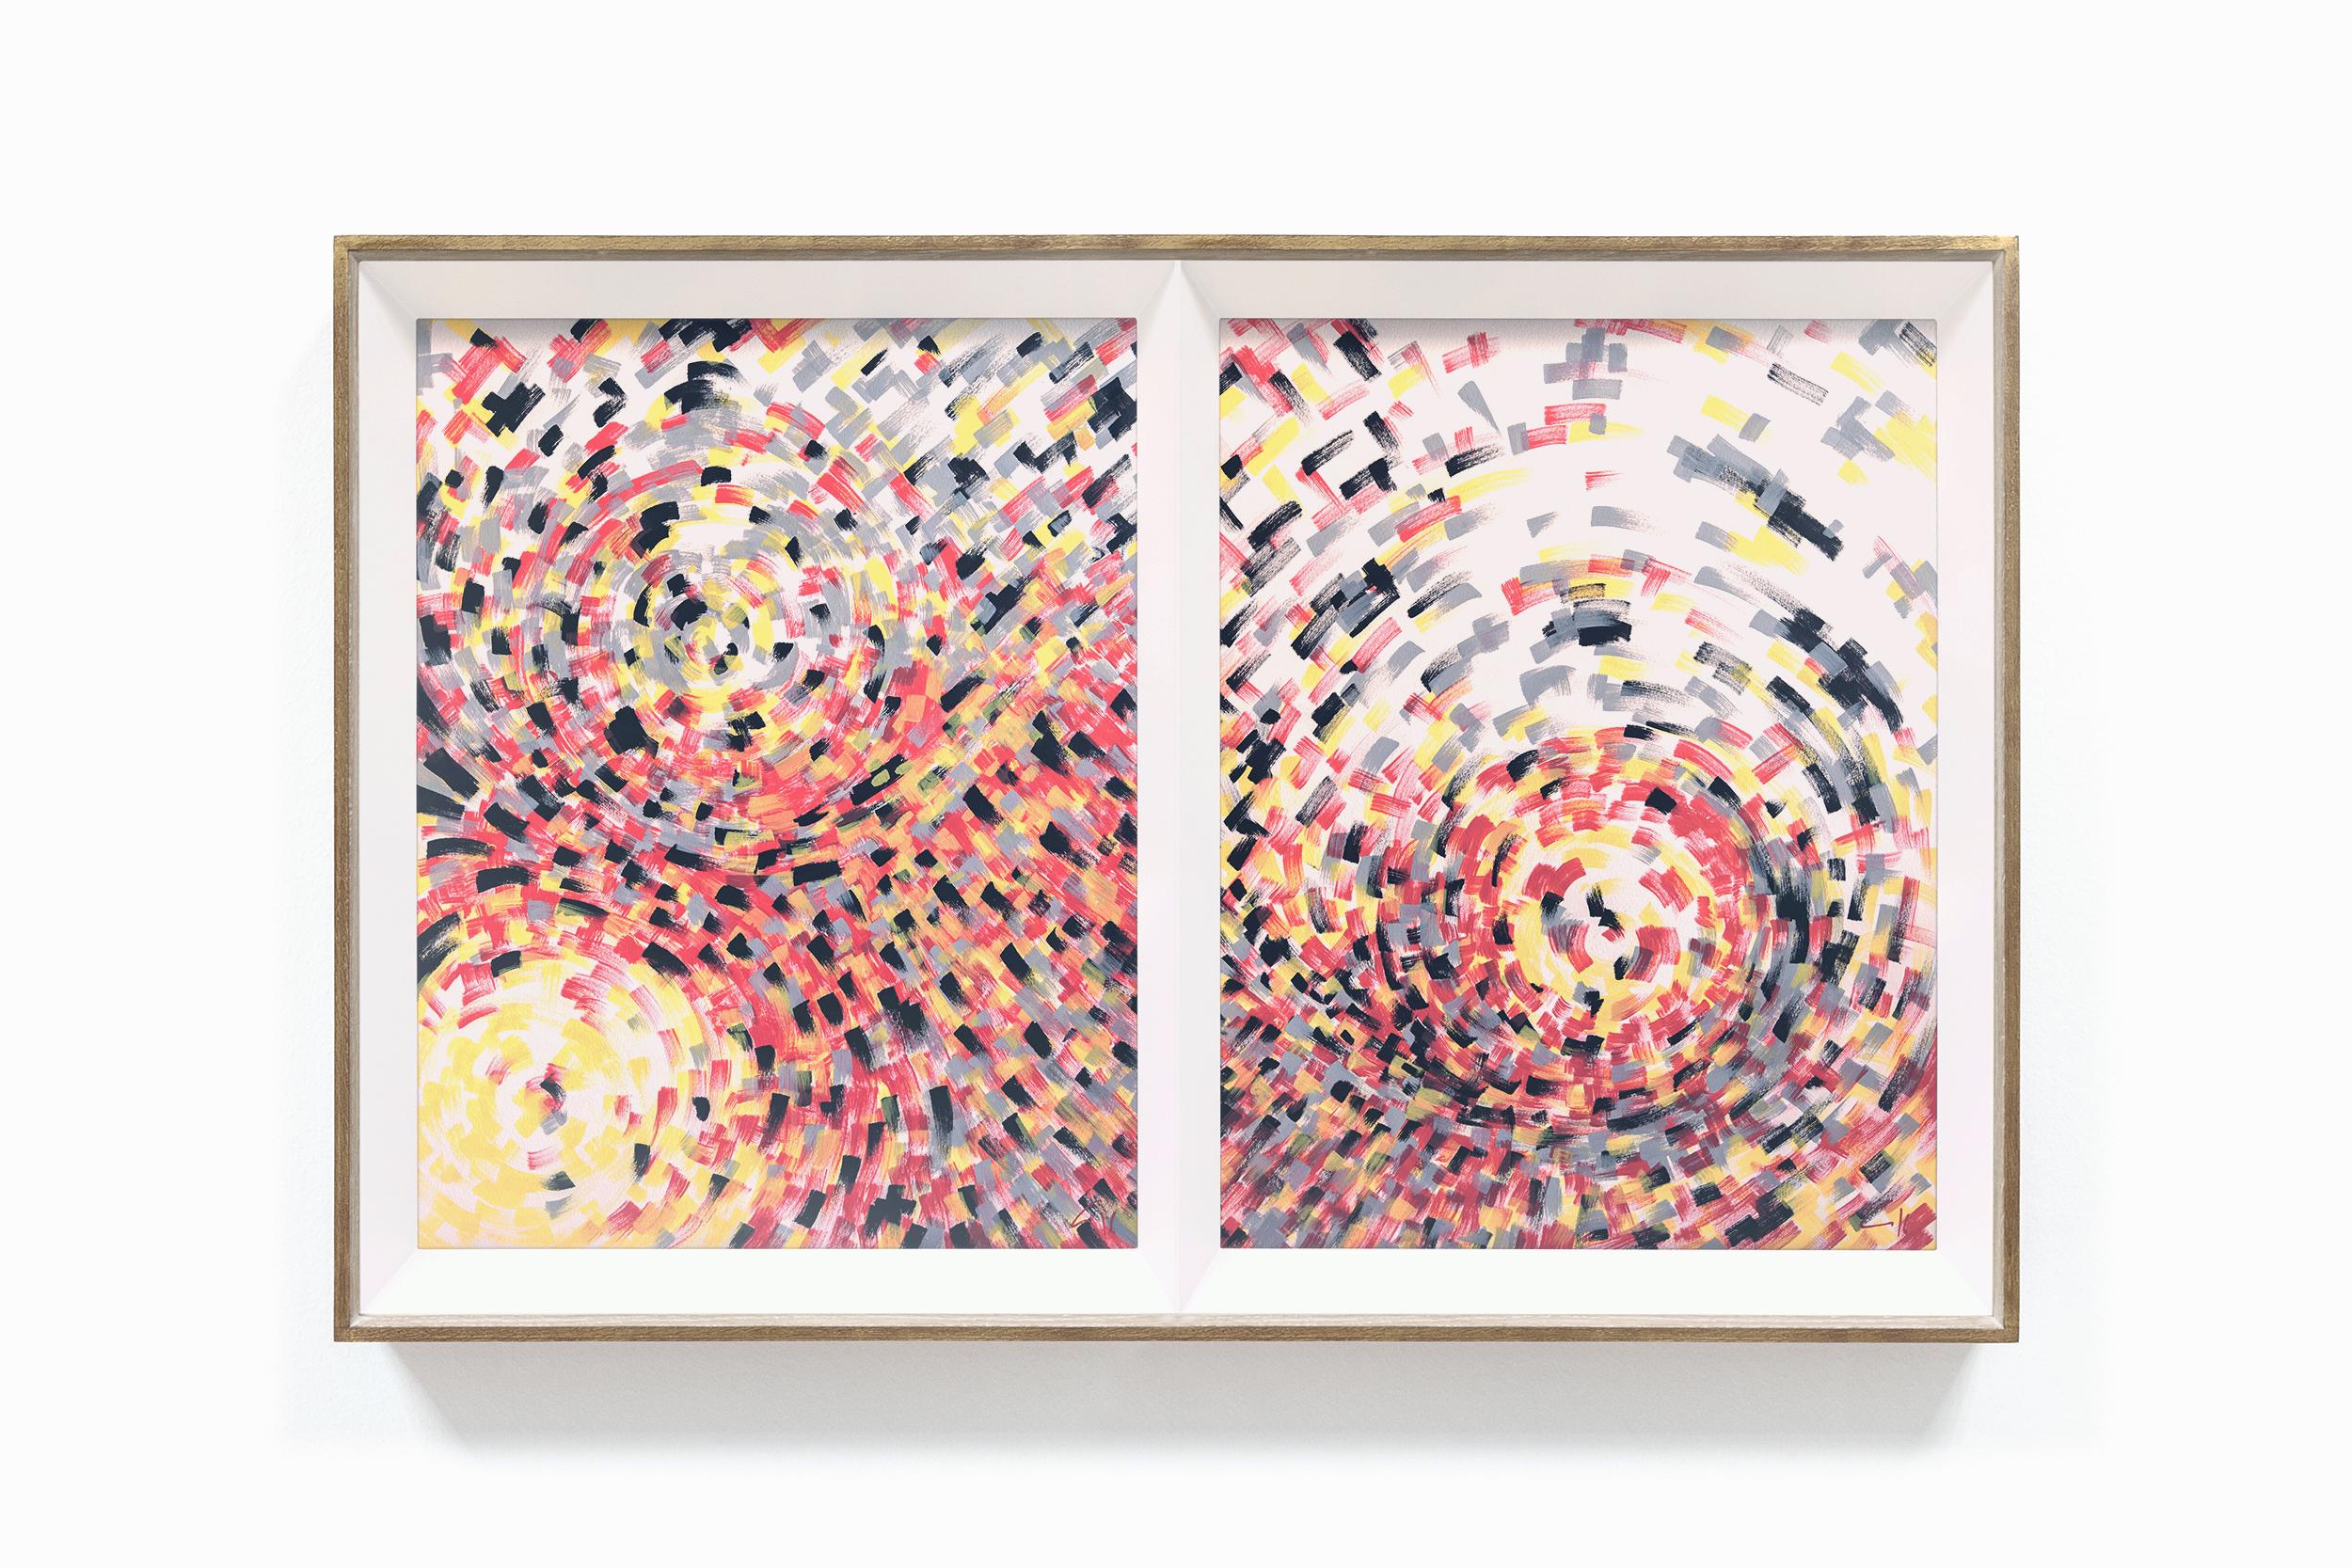 bonjourmolotov Crowded series series Illustration Ilustracao painting pintura acrylic acrílico canvas tela paper cardboard mdf Andre Gigante 04N14.jpg